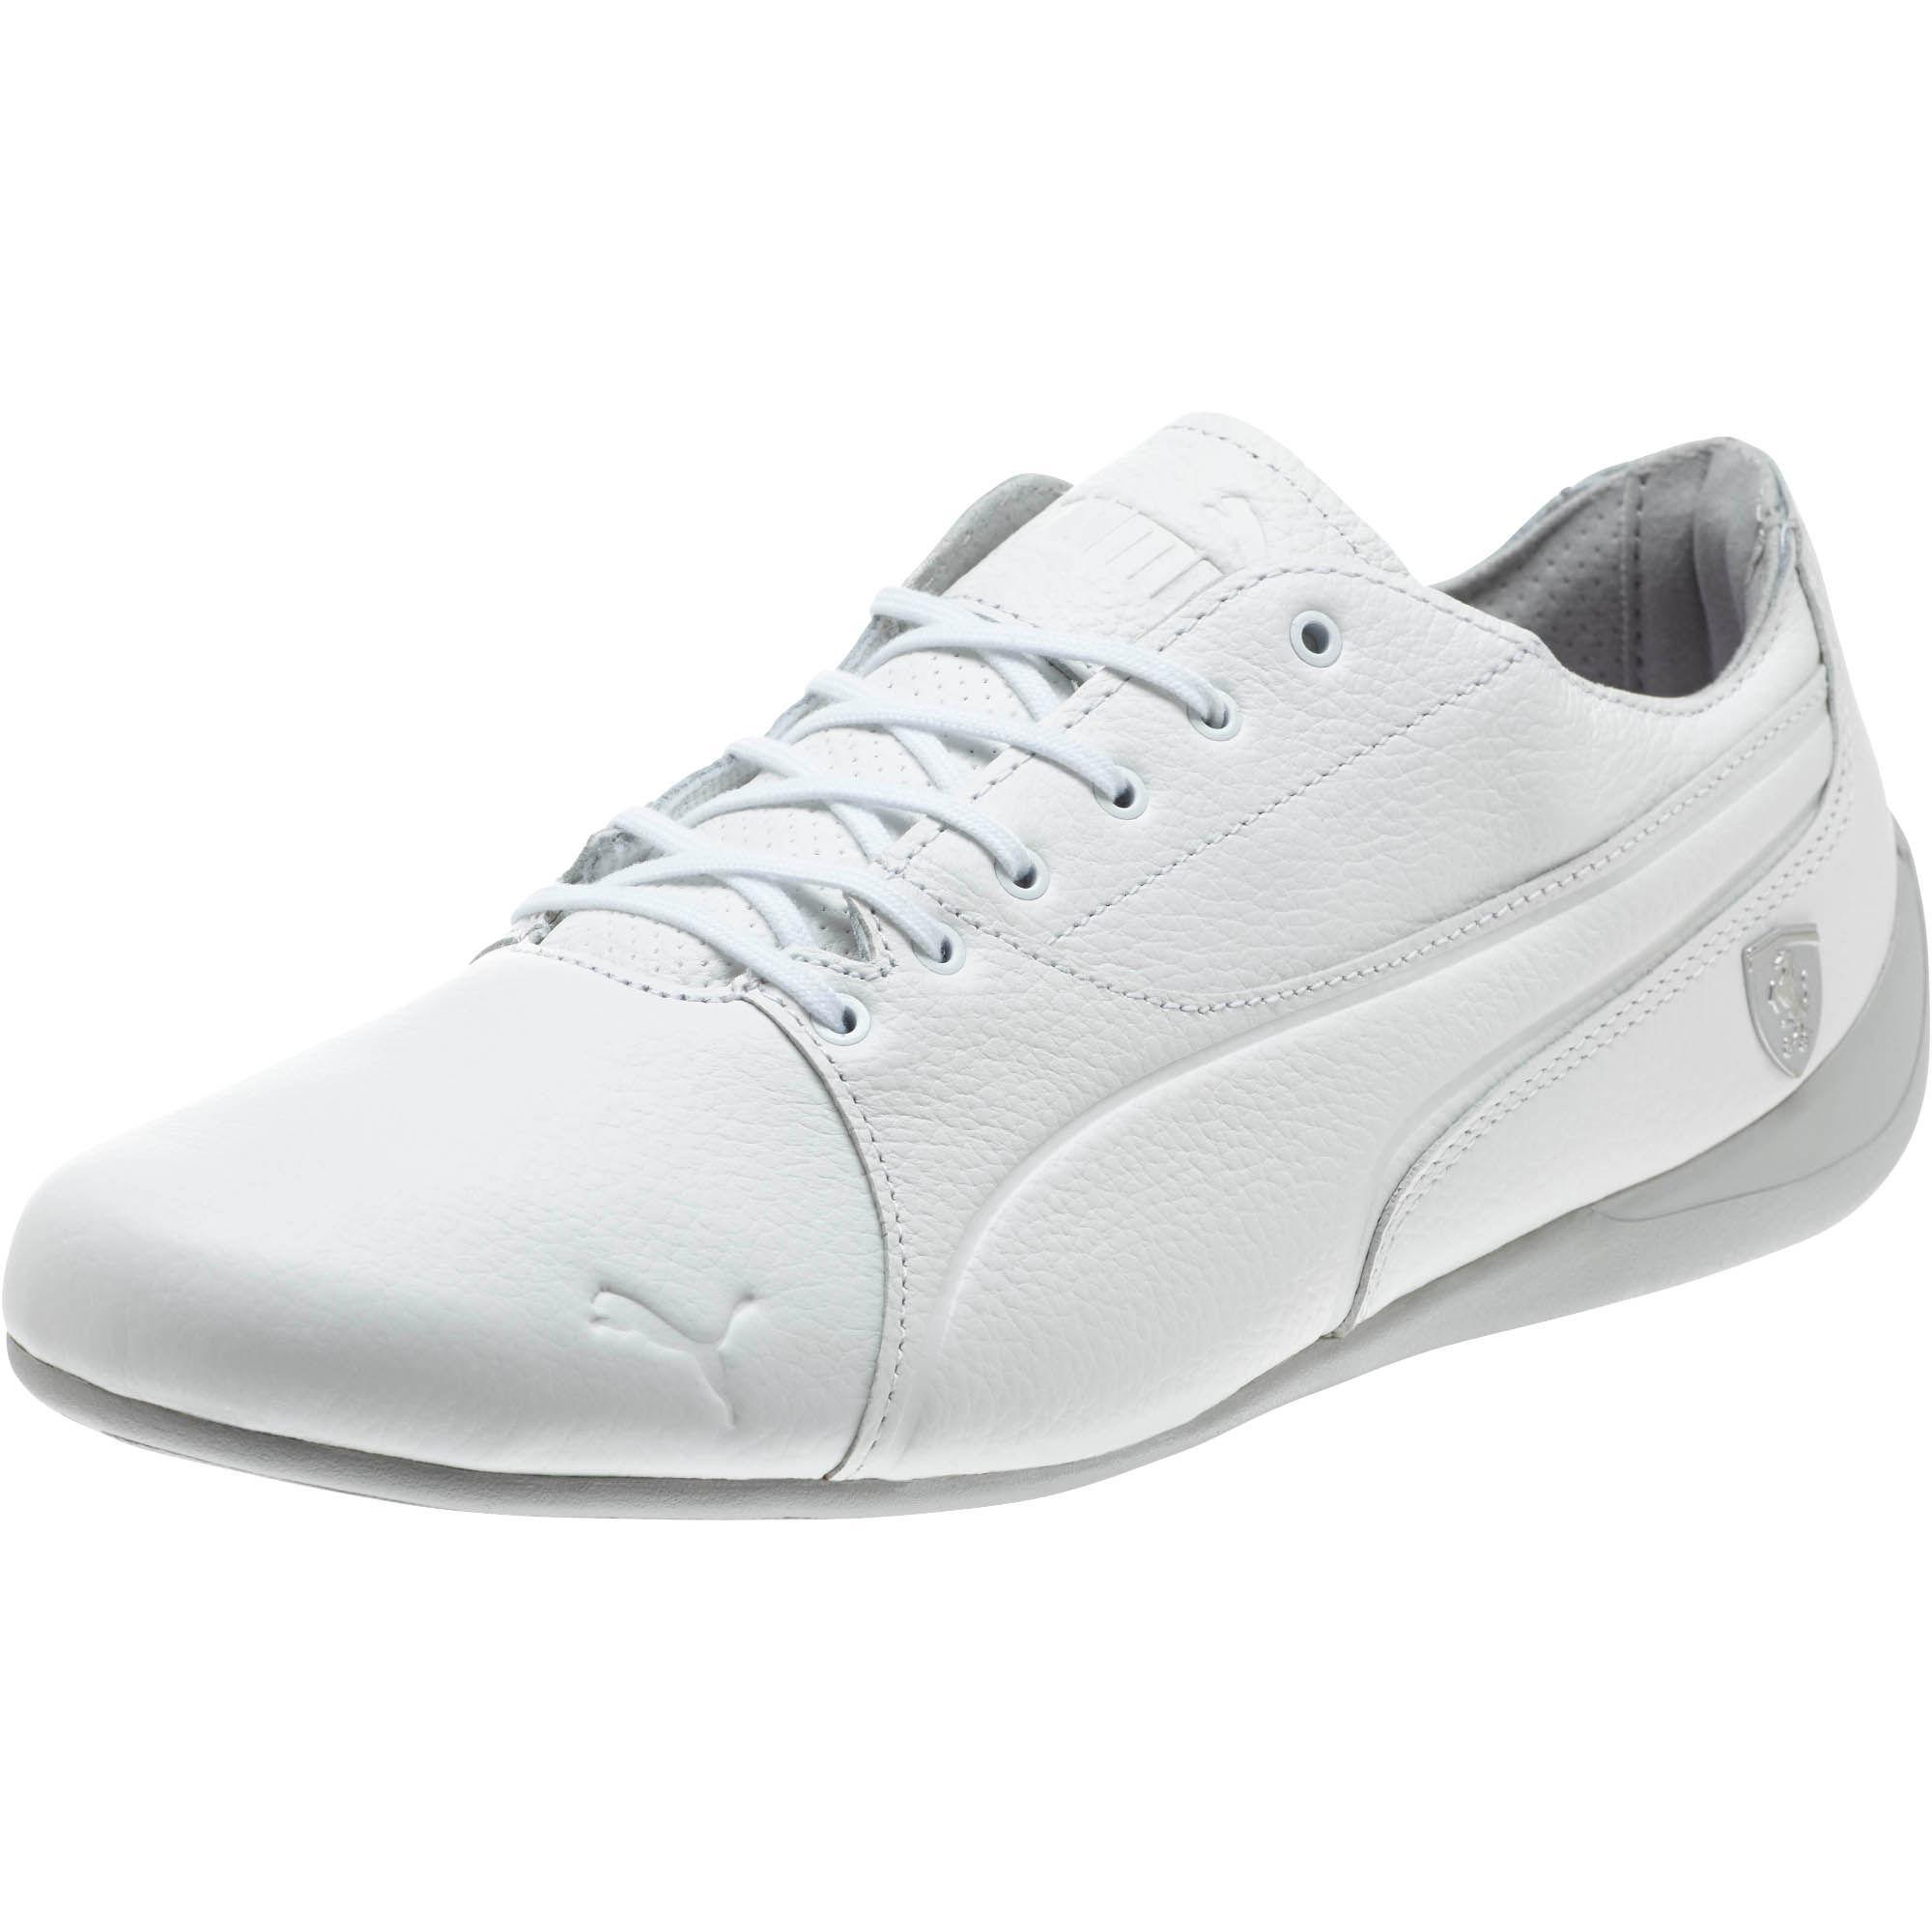 e3235573d7b9d9 Lyst - PUMA Ferrari Drift Cat 7 Ls White Shoes in White for Men